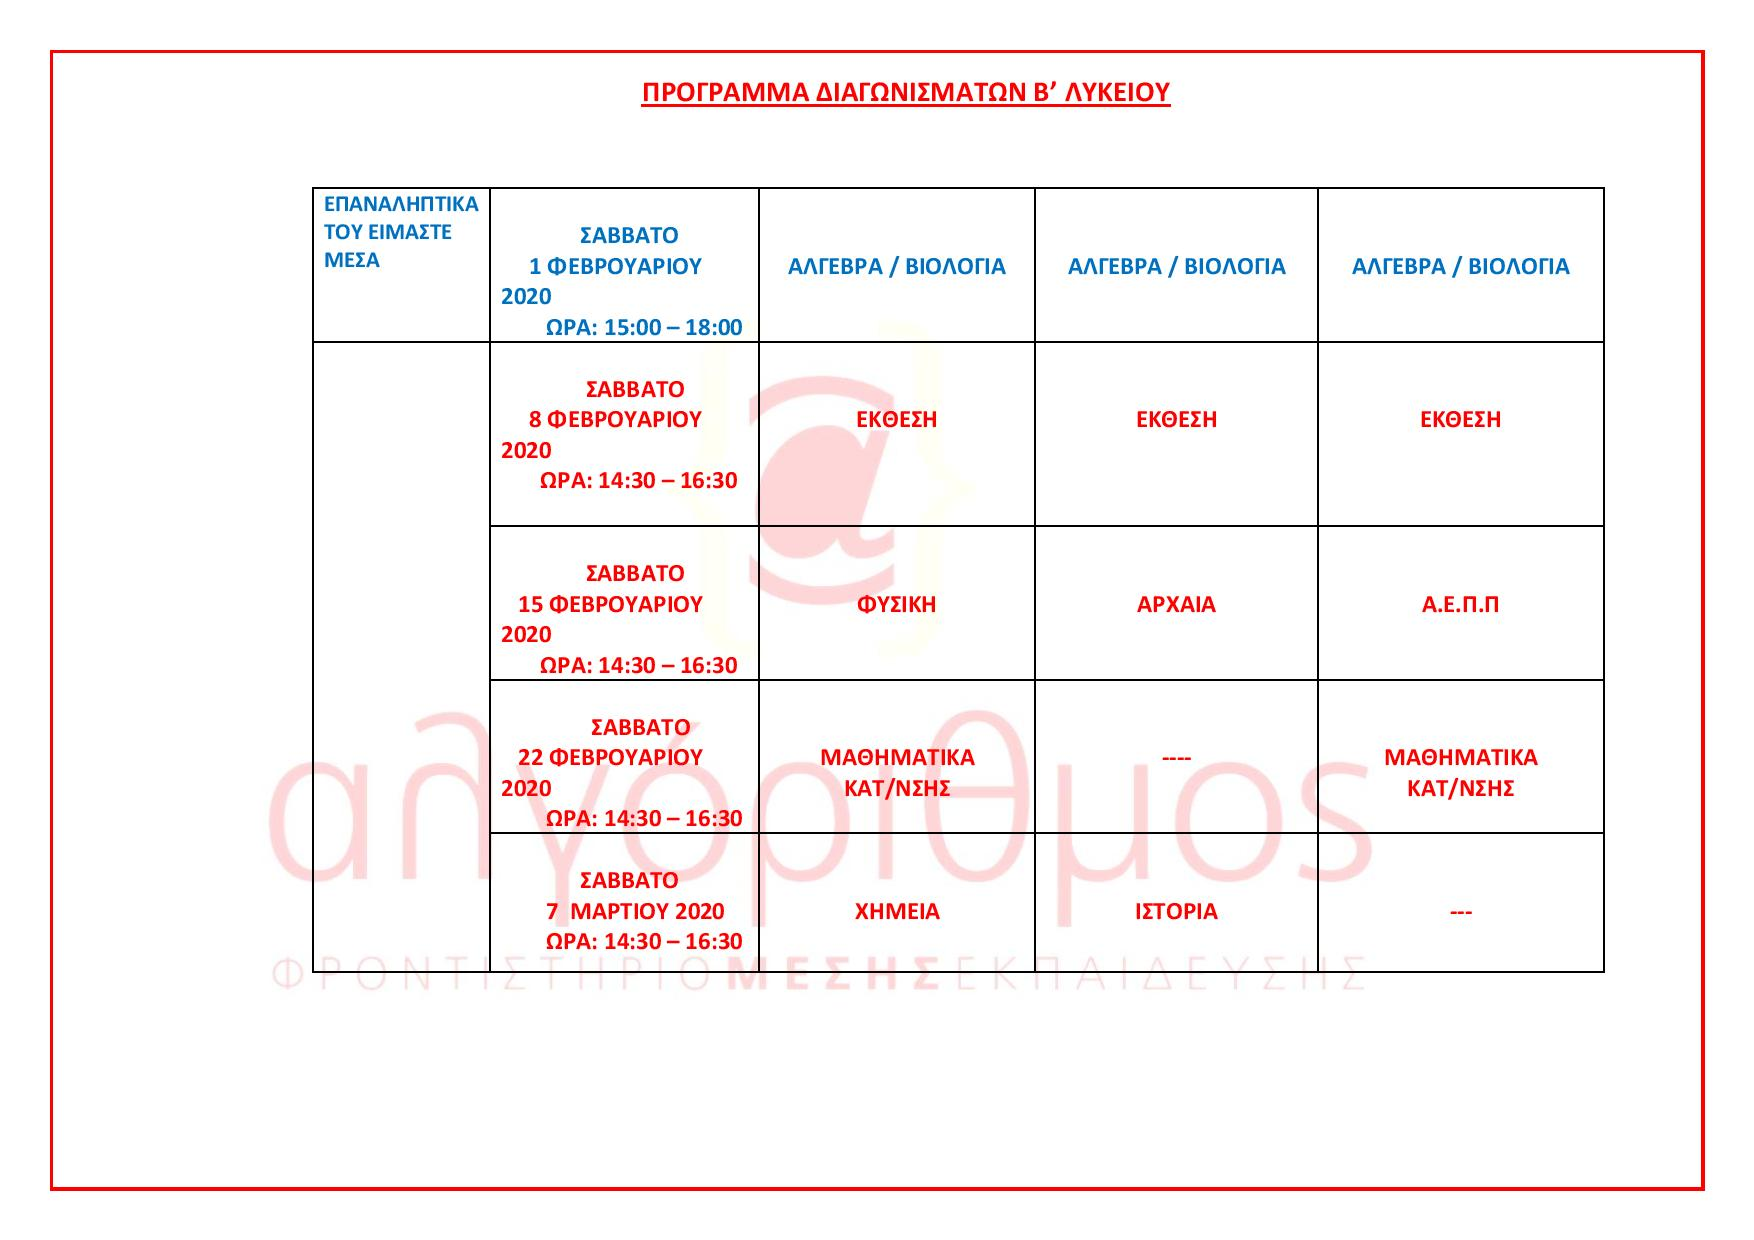 diagonismata-b-likeiou-b-kiklos.jpg-1